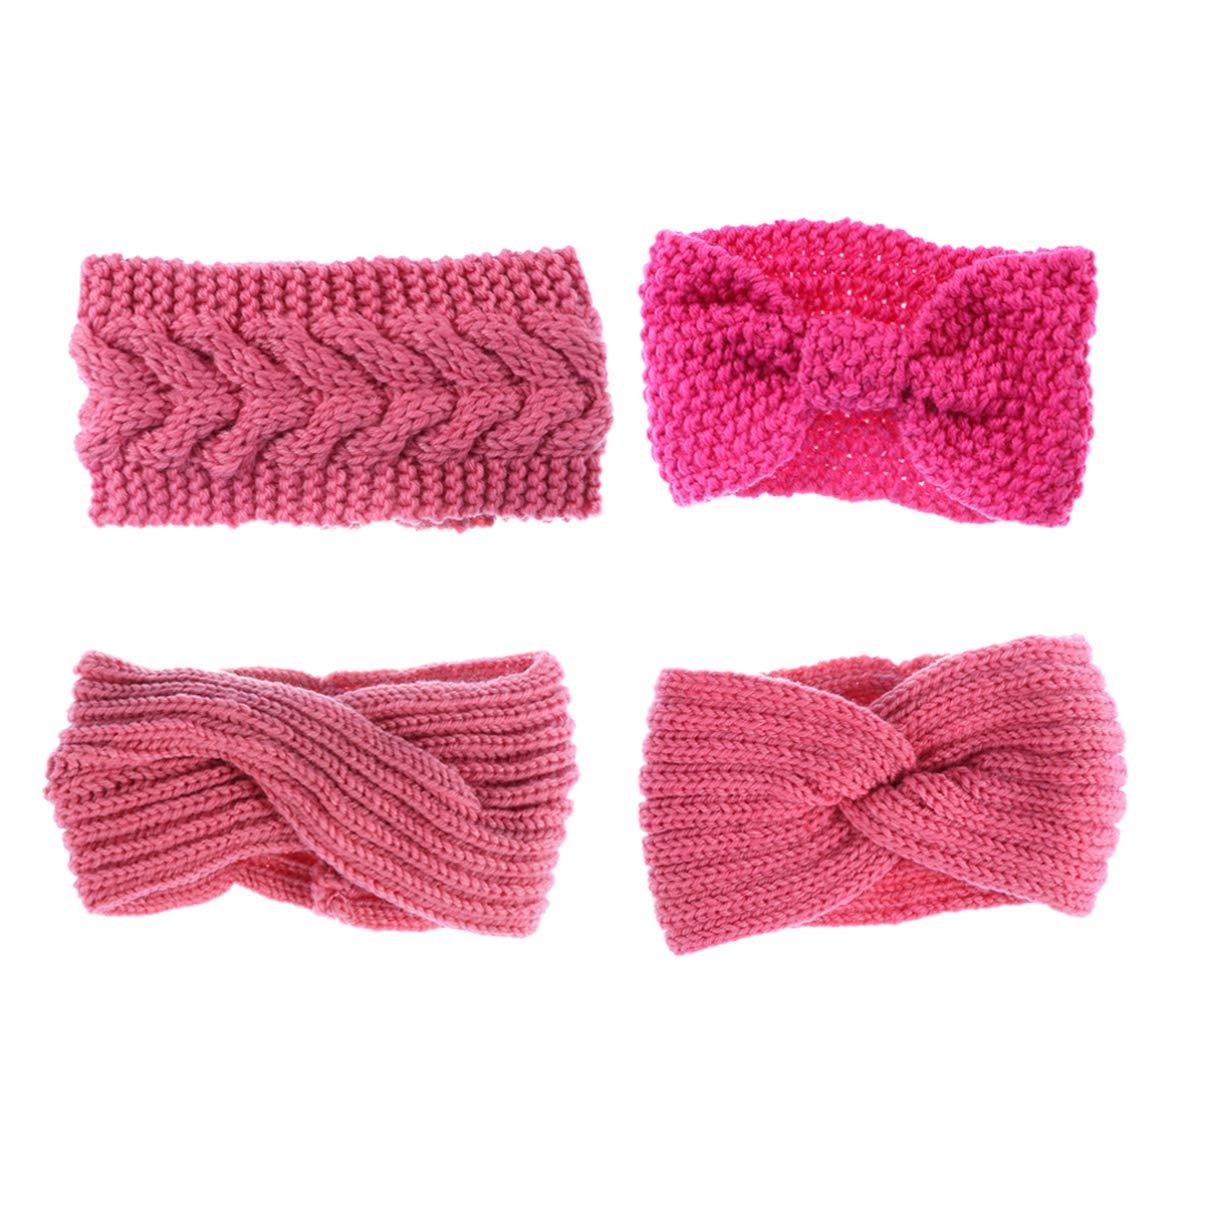 Beaupretty Chunky Knit...